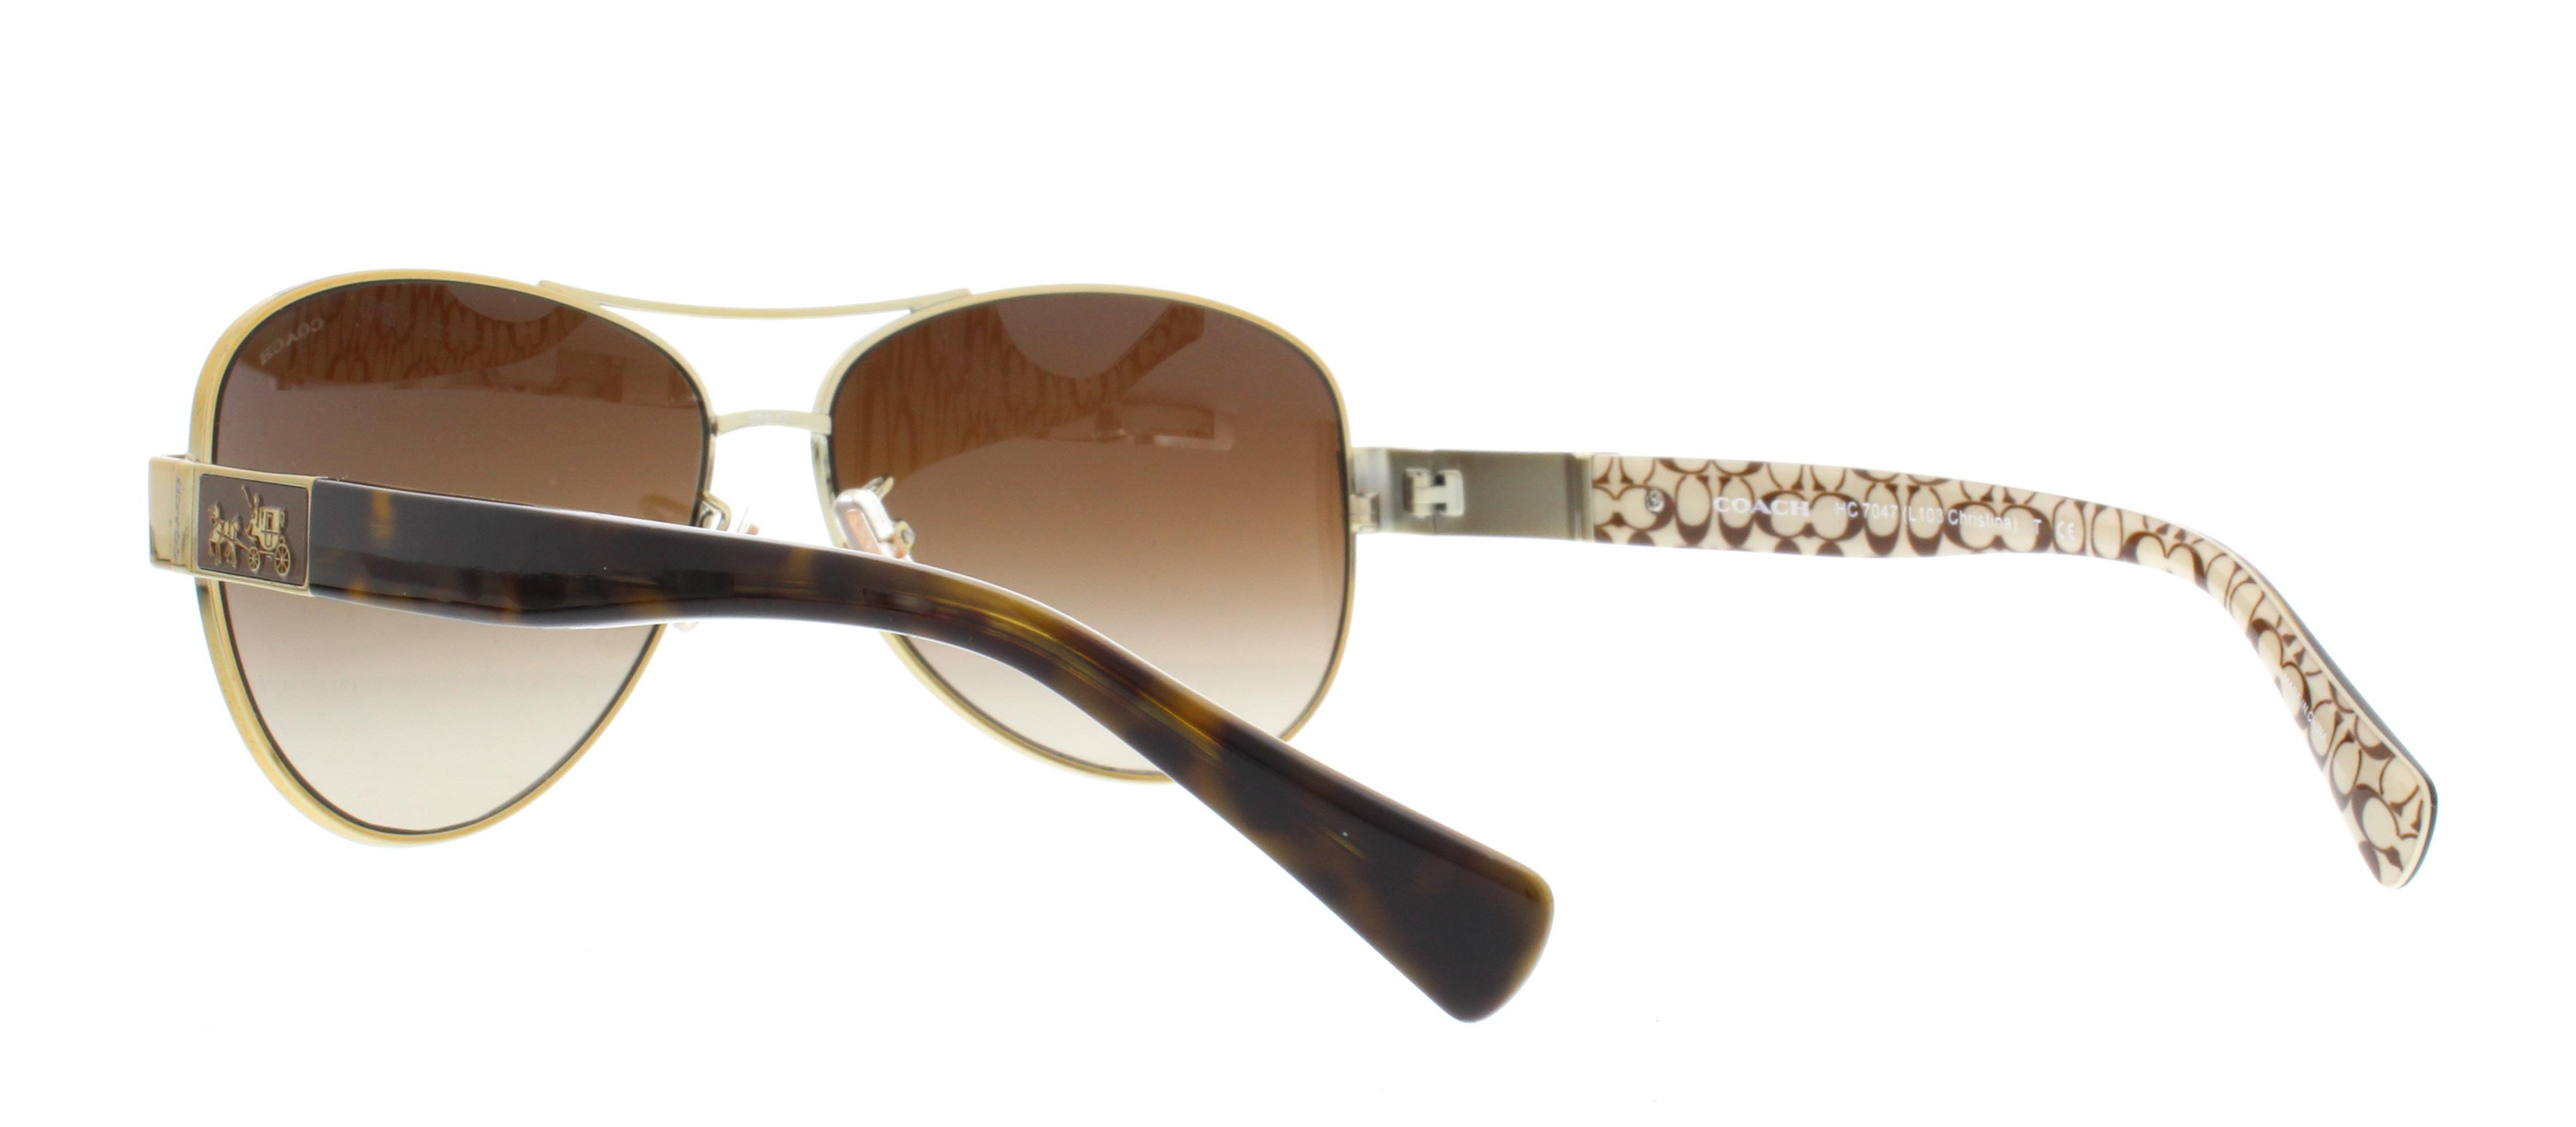 ebc9fd2edd11 coupon for coach l103 christina hc7047 sunglasses 920213 59 gold dark hc7047  21ee3 00861